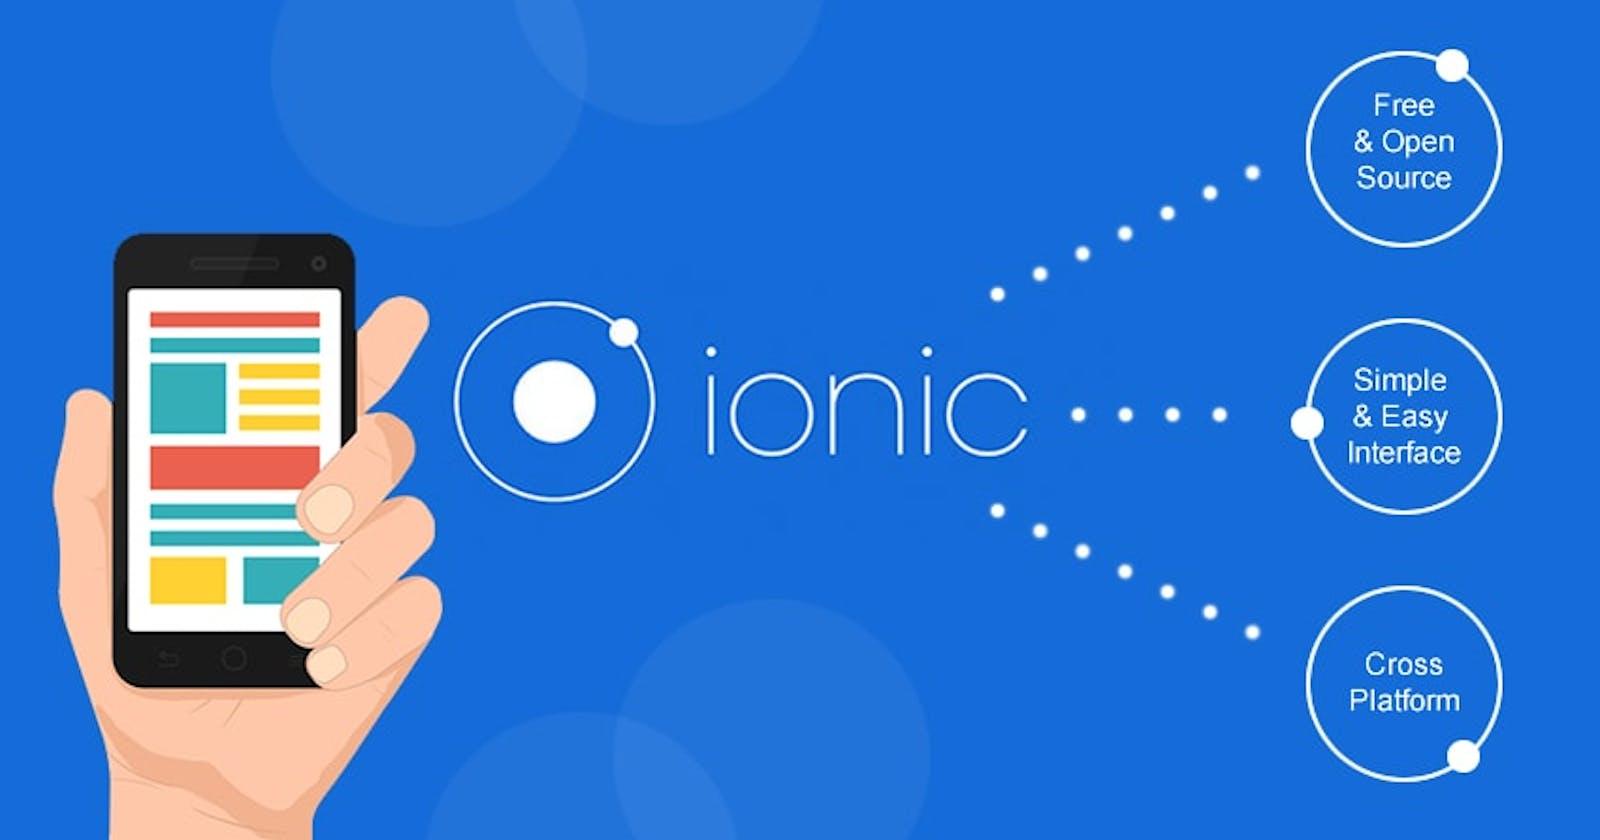 Ionic for Cross Platform Mobile App Development - Overview